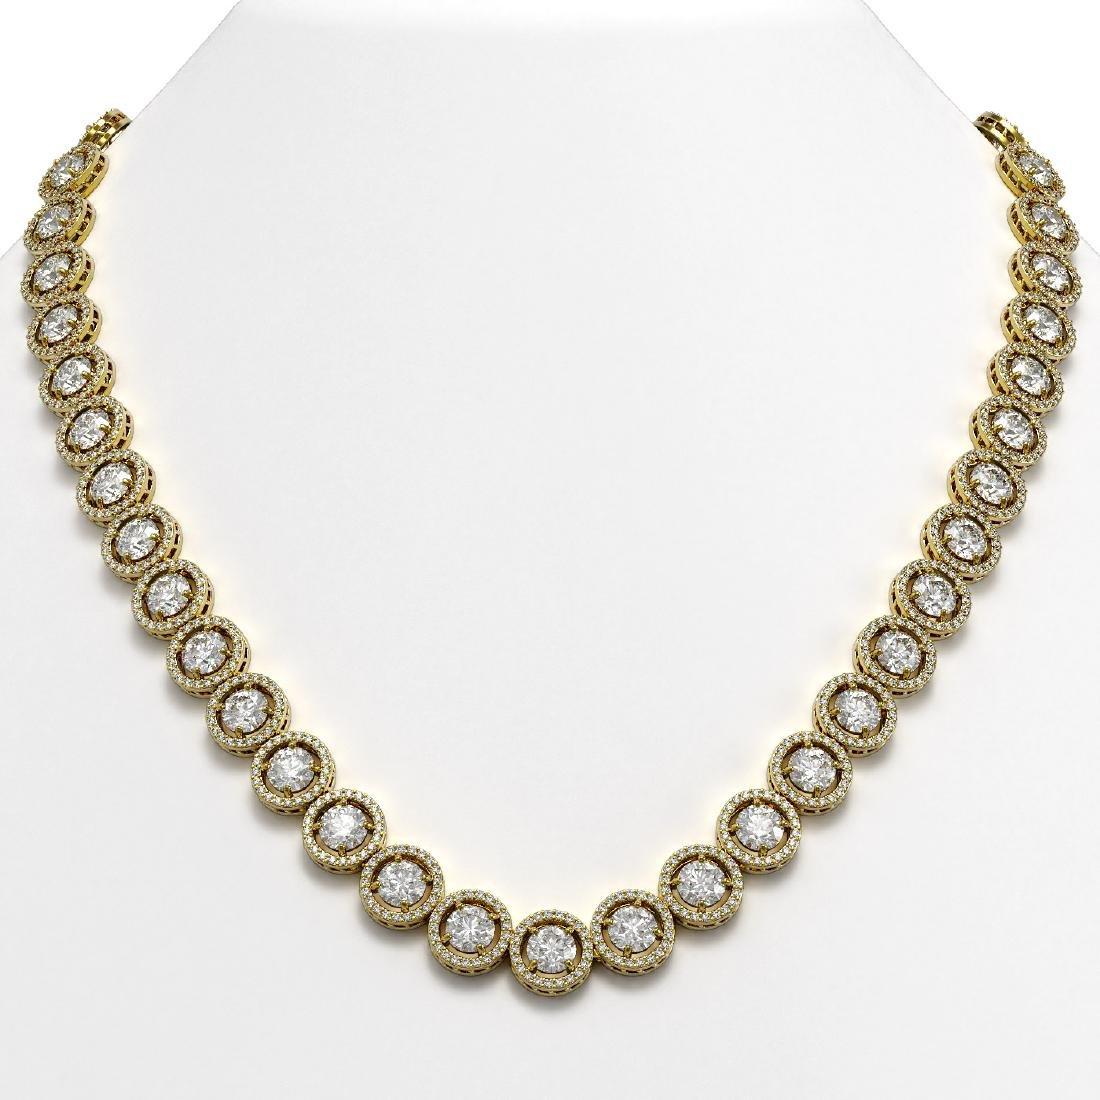 35.32 CTW Diamond Designer Necklace 18K Yellow Gold